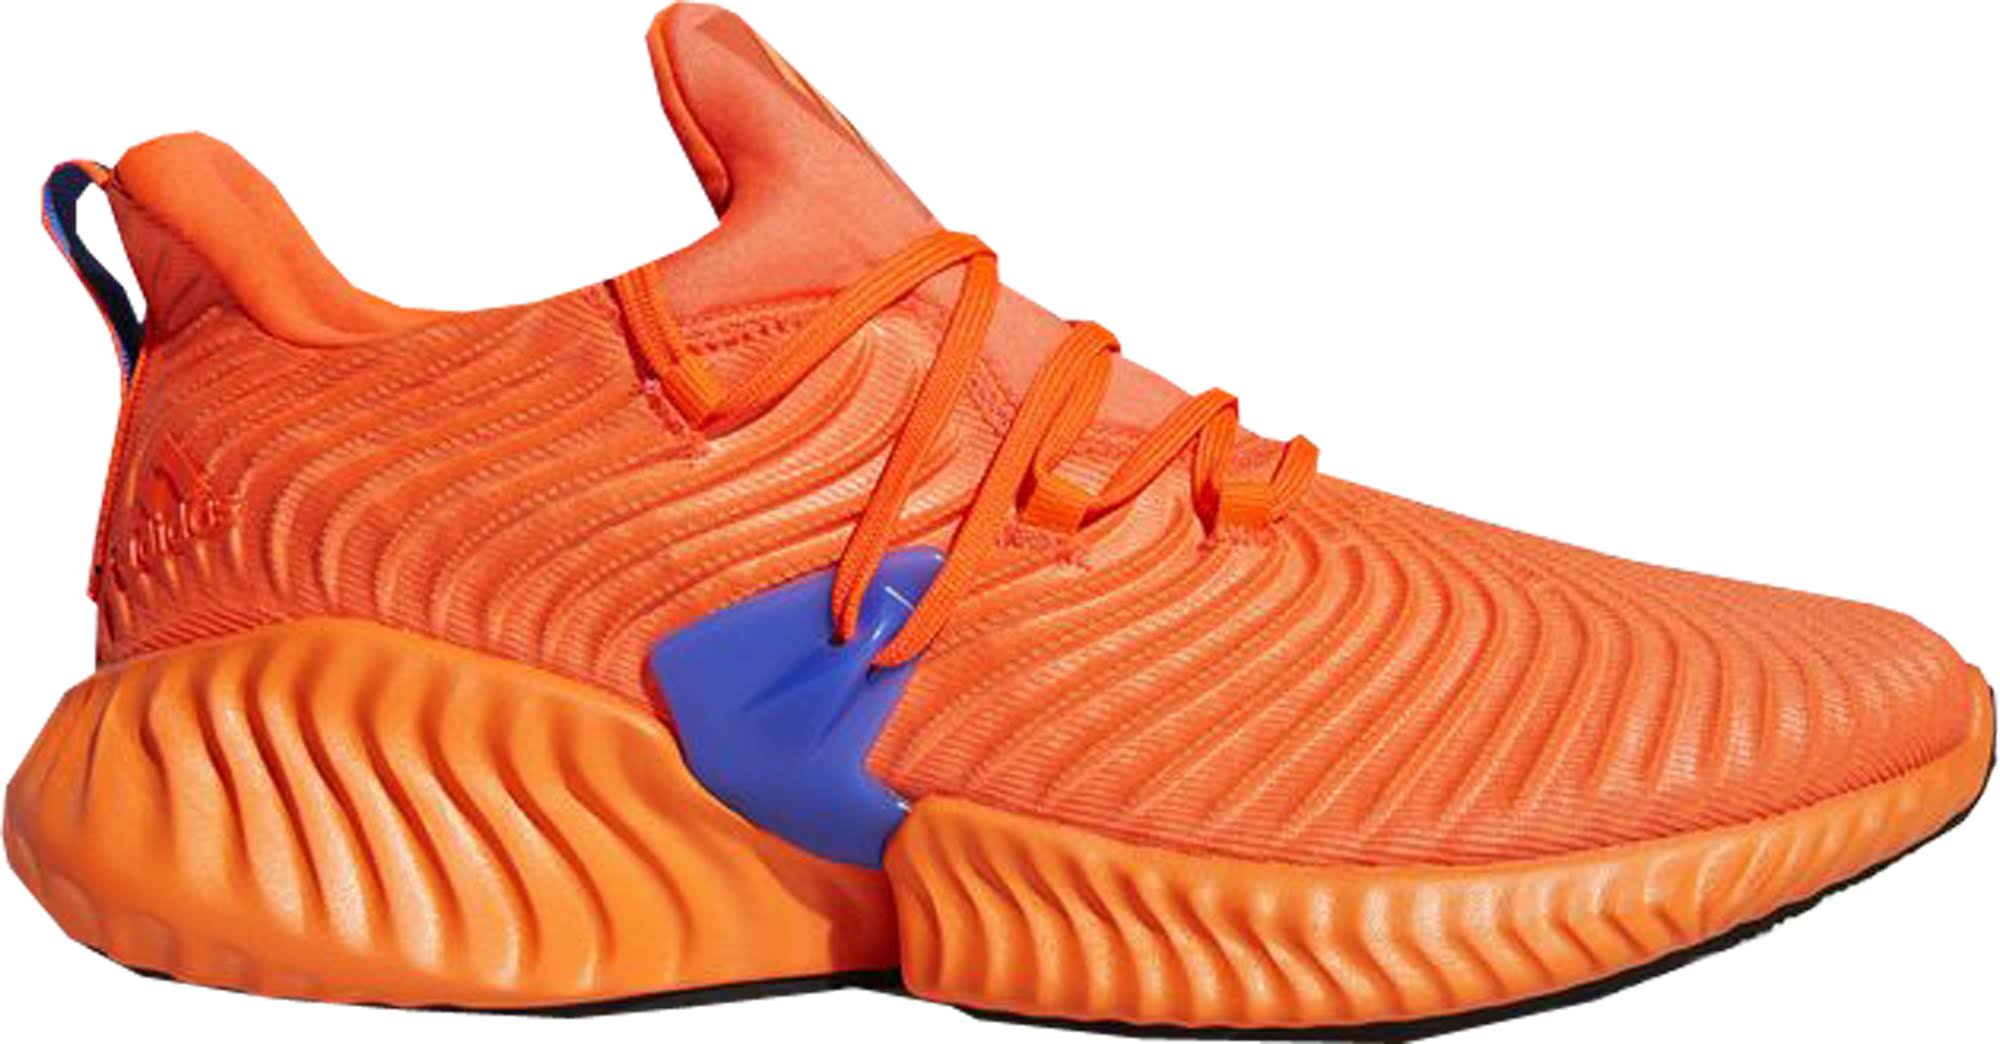 Adidas Alphabounce Instinct Hi Res Orange